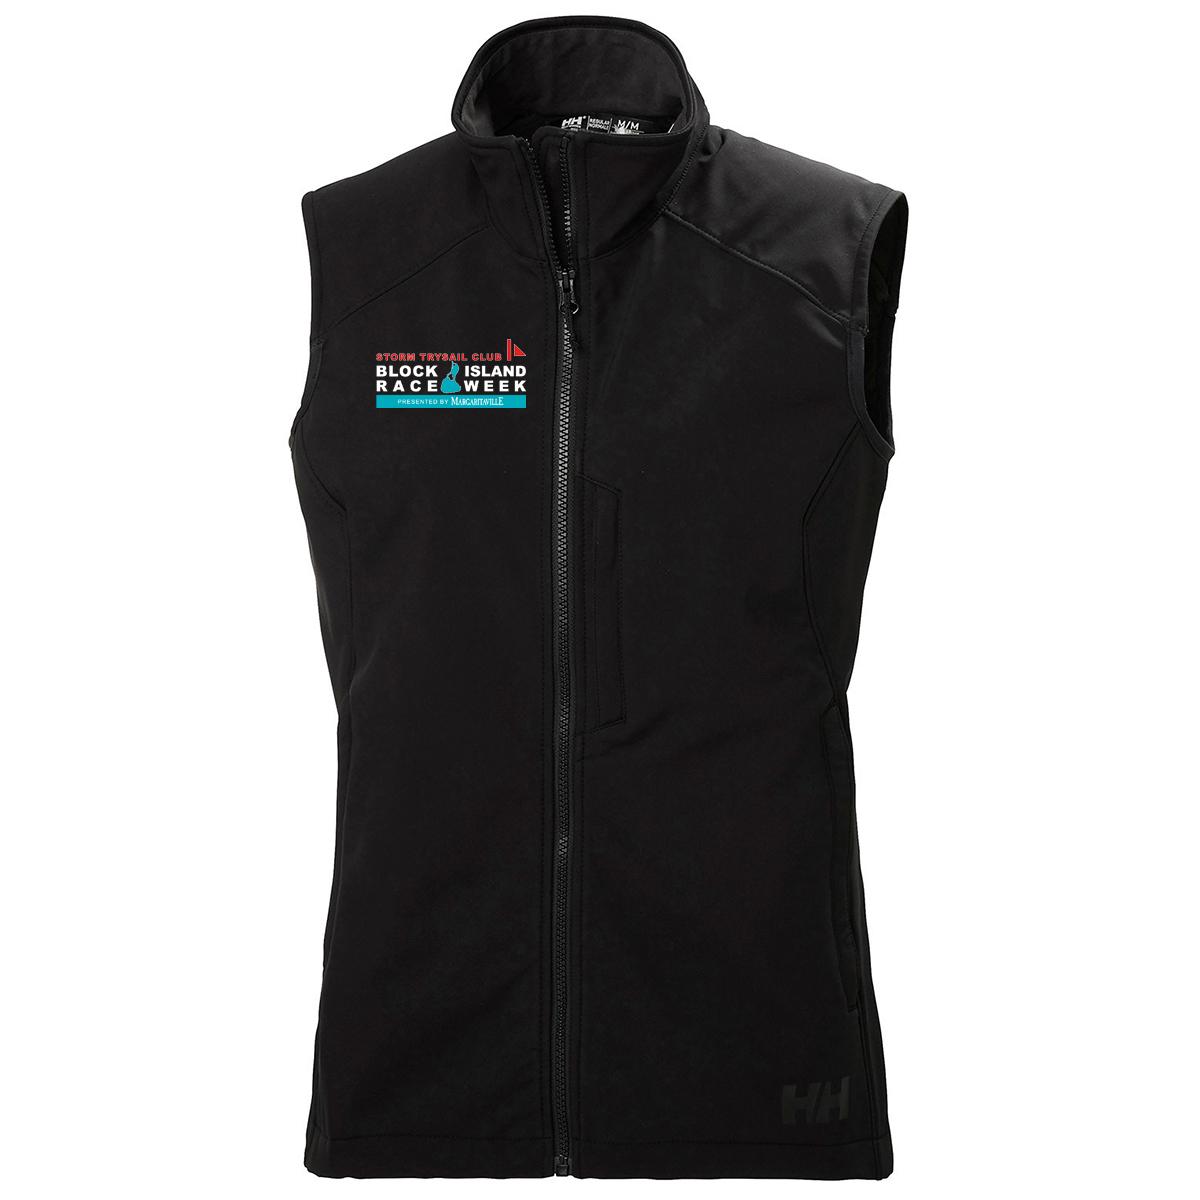 Block Island Race Week 2021 - Women's Helly Hansen Paramount Vest